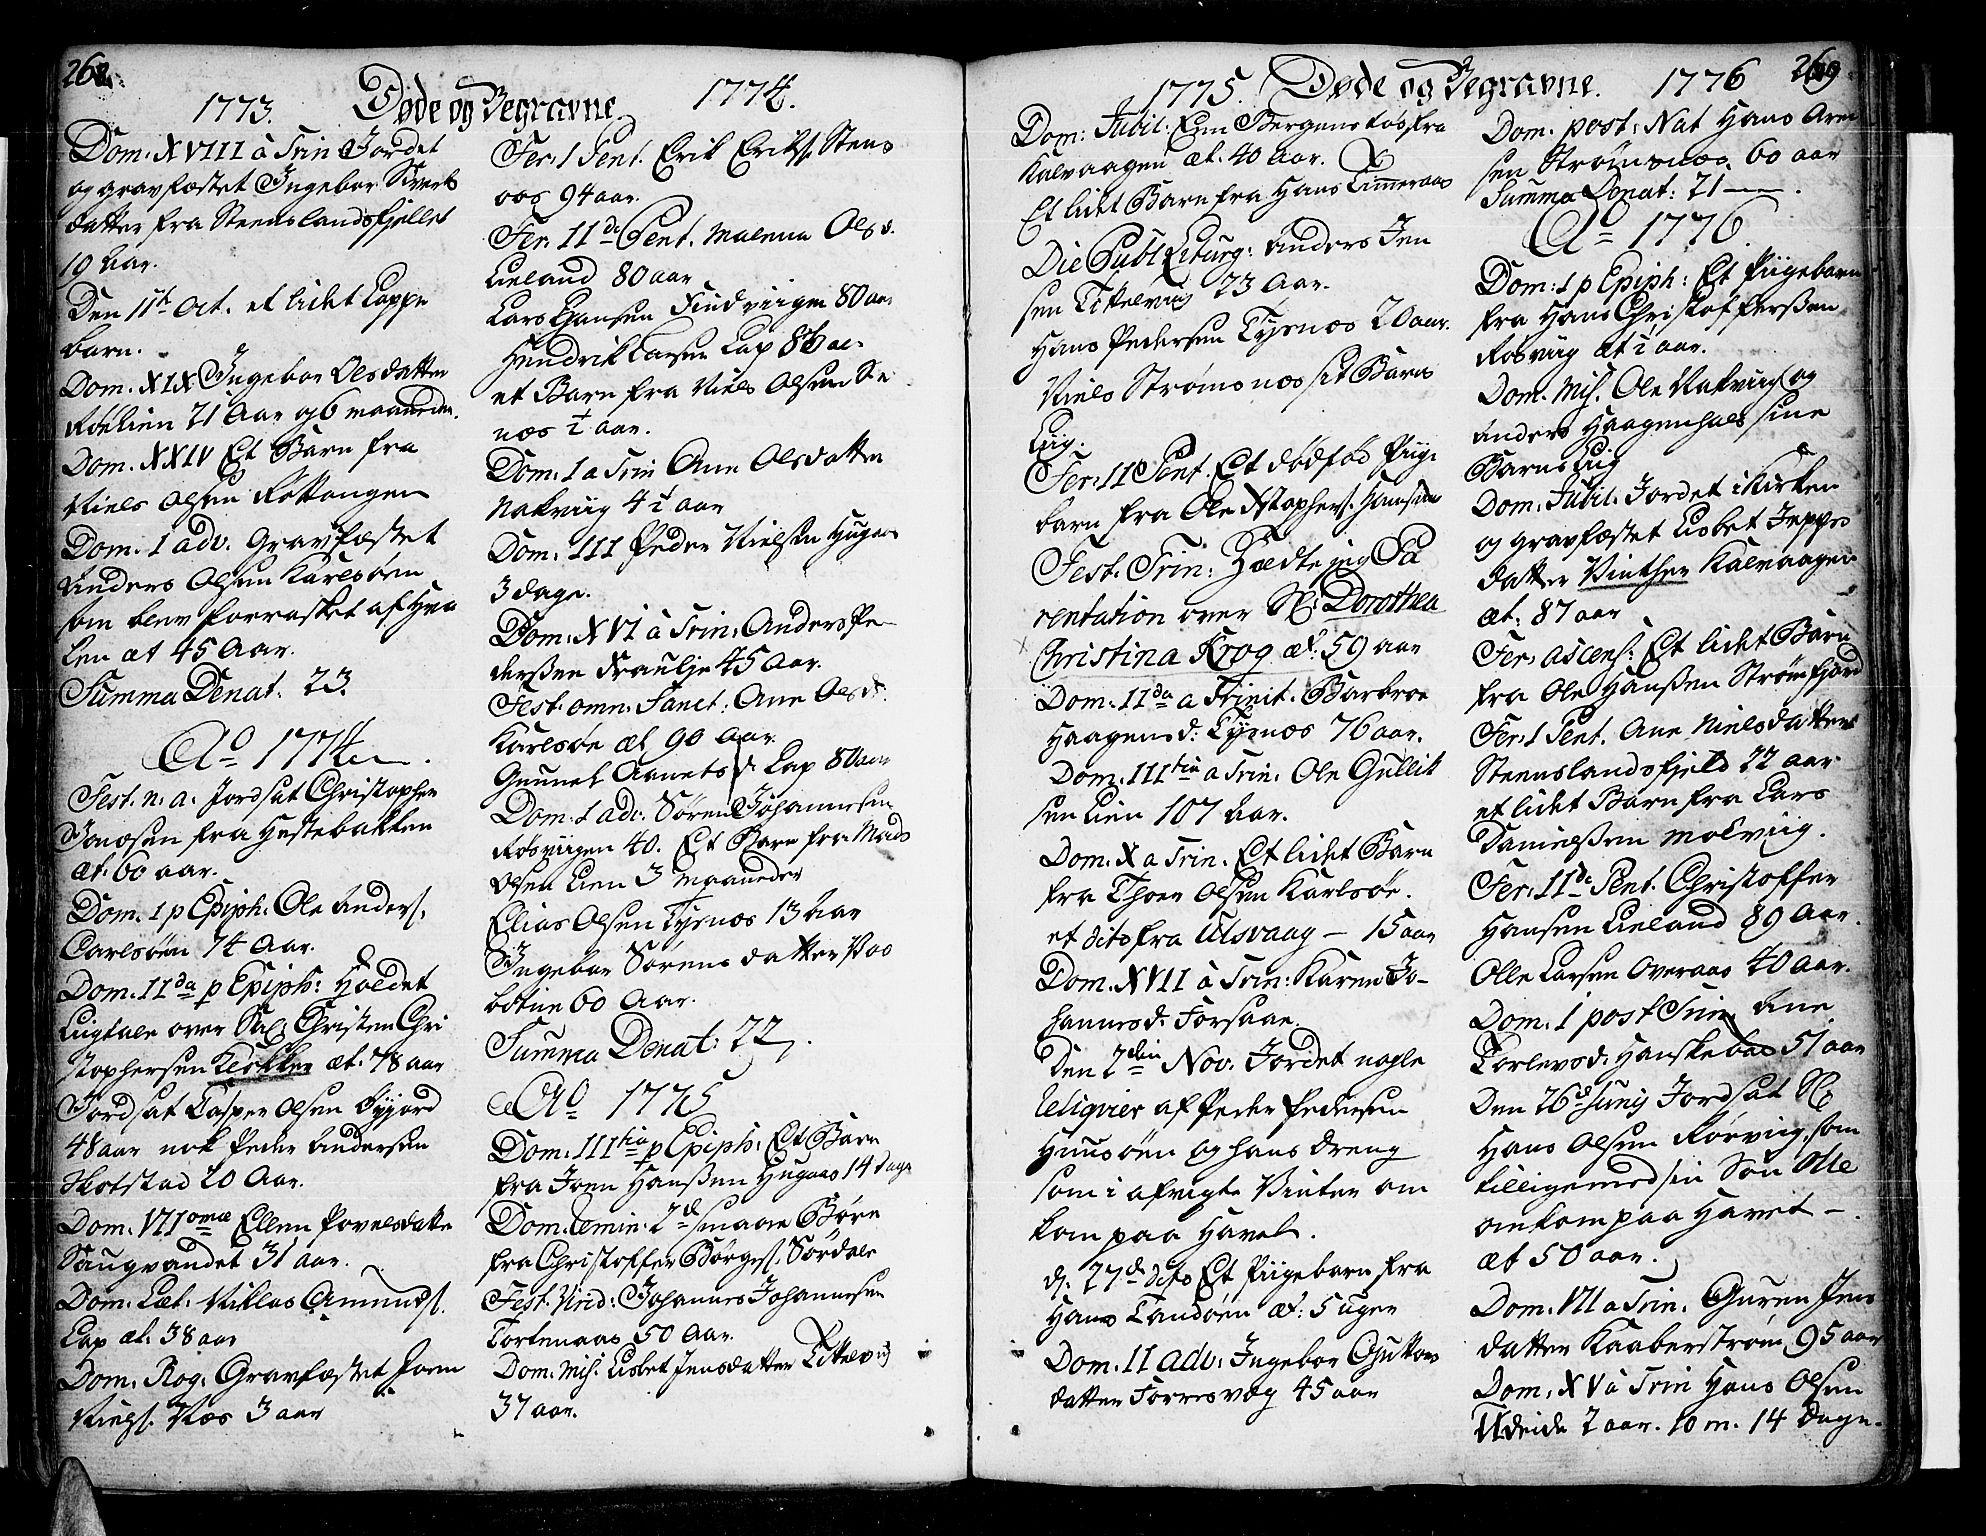 SAT, Ministerialprotokoller, klokkerbøker og fødselsregistre - Nordland, 859/L0841: Ministerialbok nr. 859A01, 1766-1821, s. 268-269